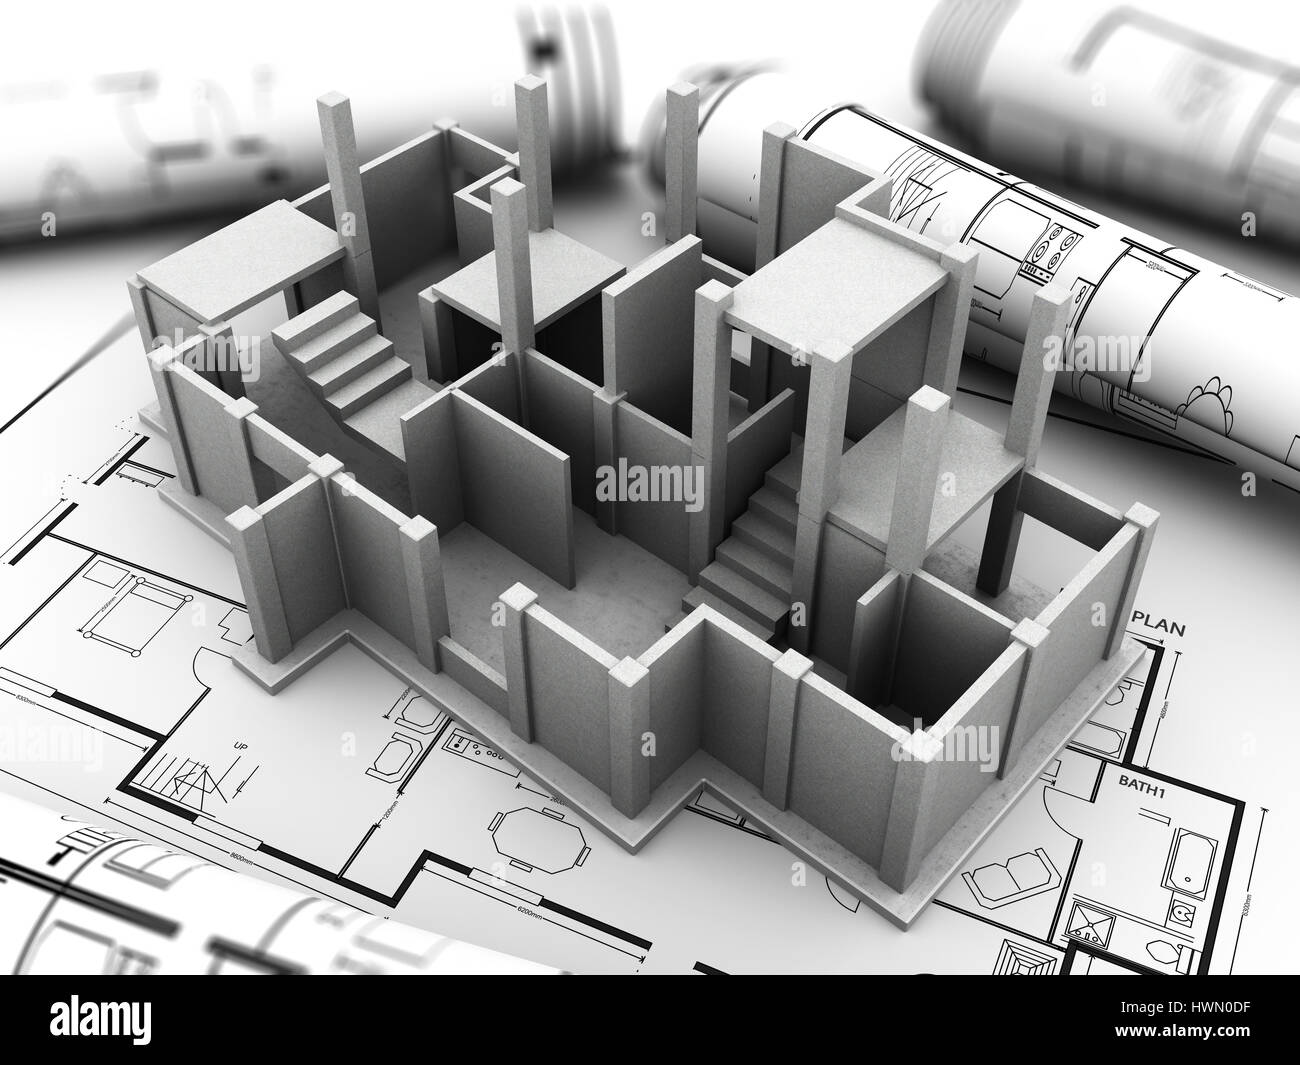 3d Illustration Of Concrete House Model And Blueprints Stock